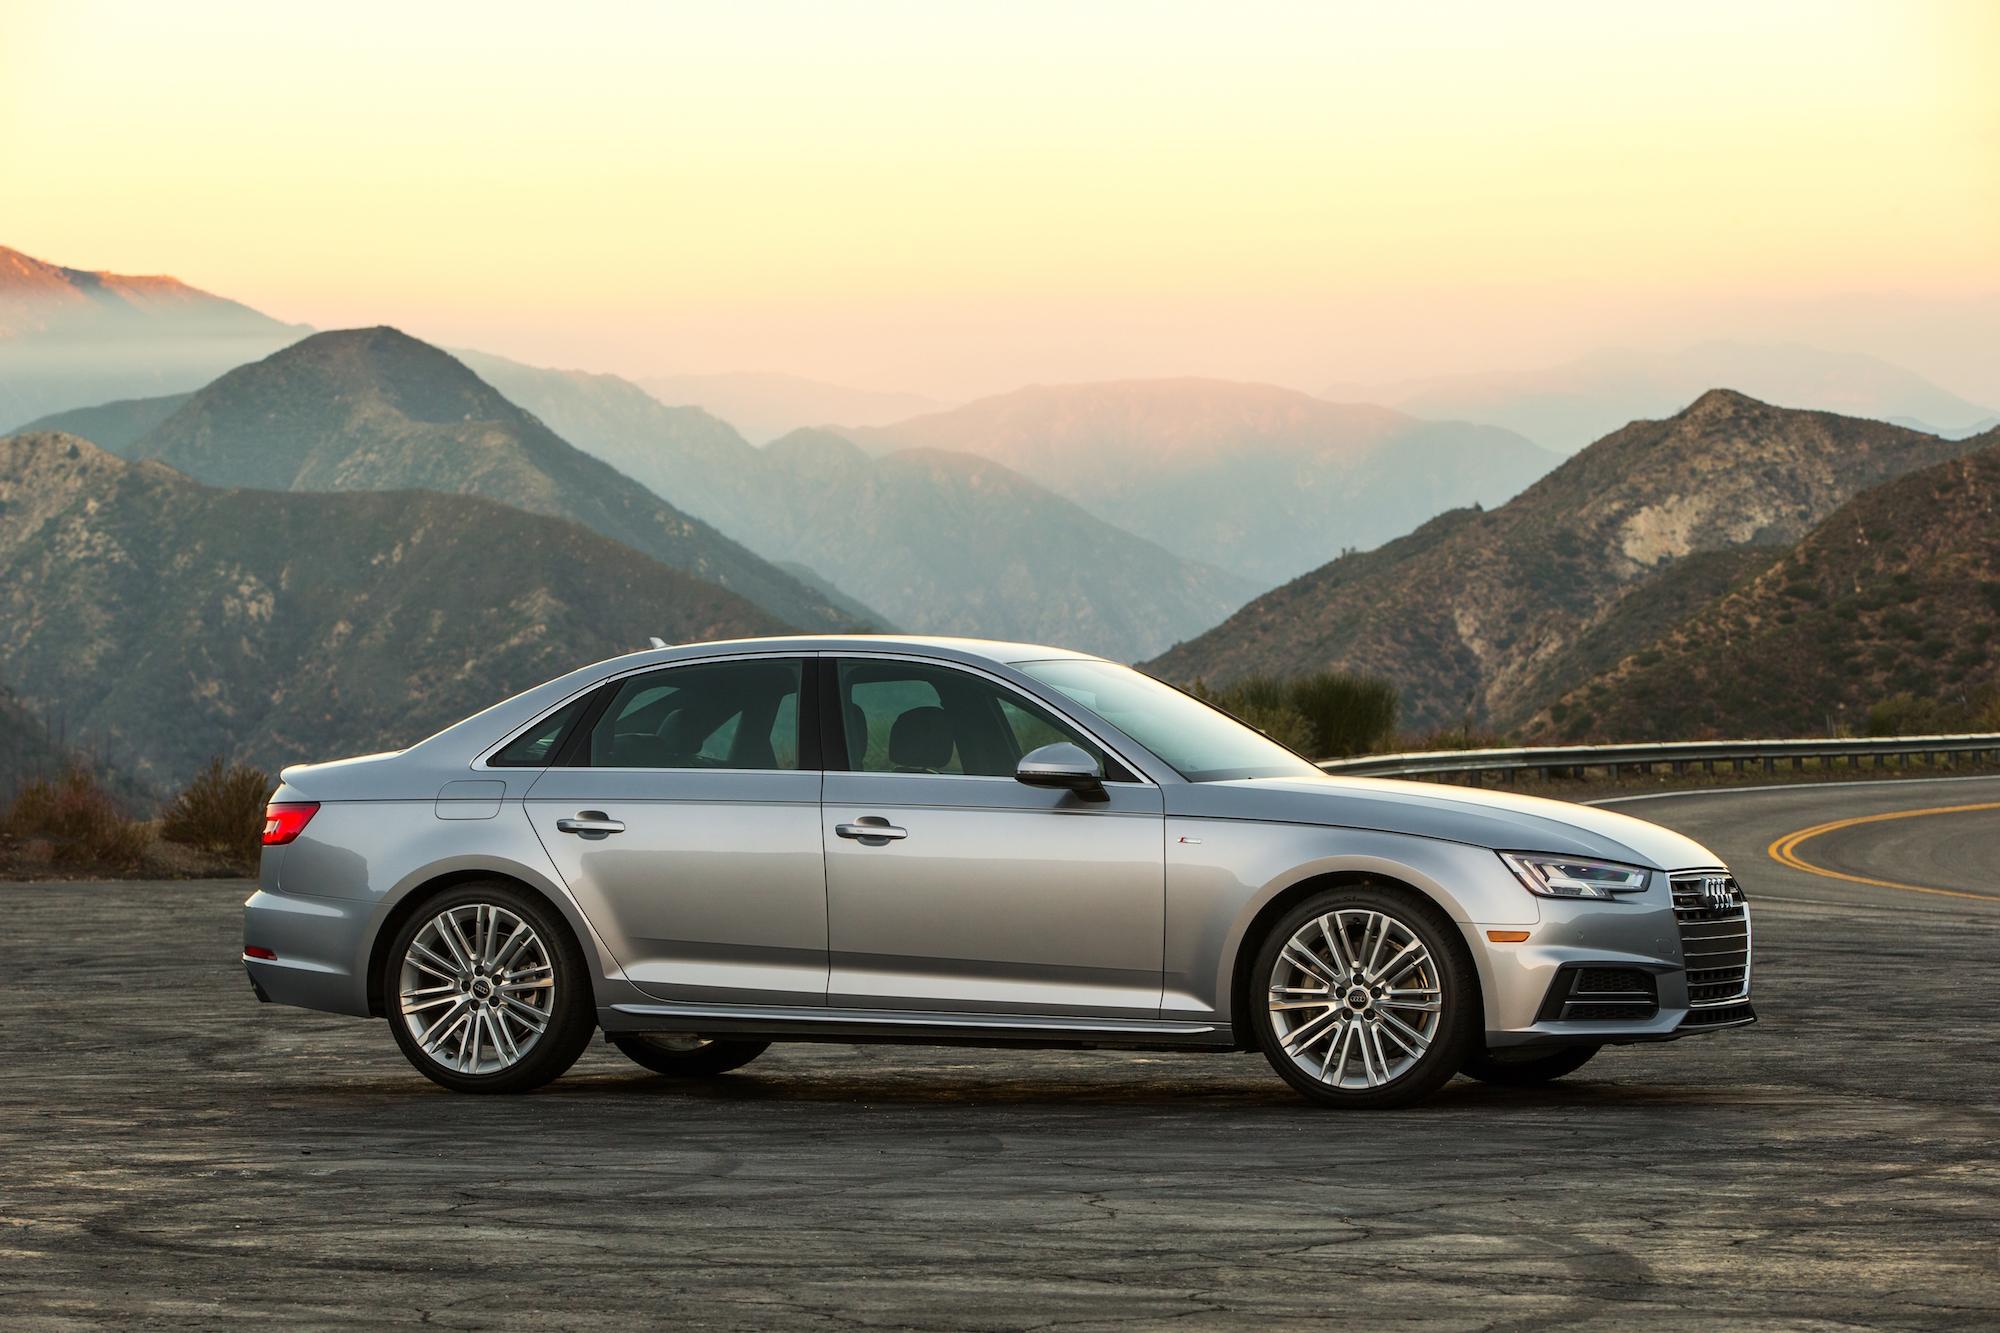 Kelebihan Kekurangan Audi 2017 Murah Berkualitas